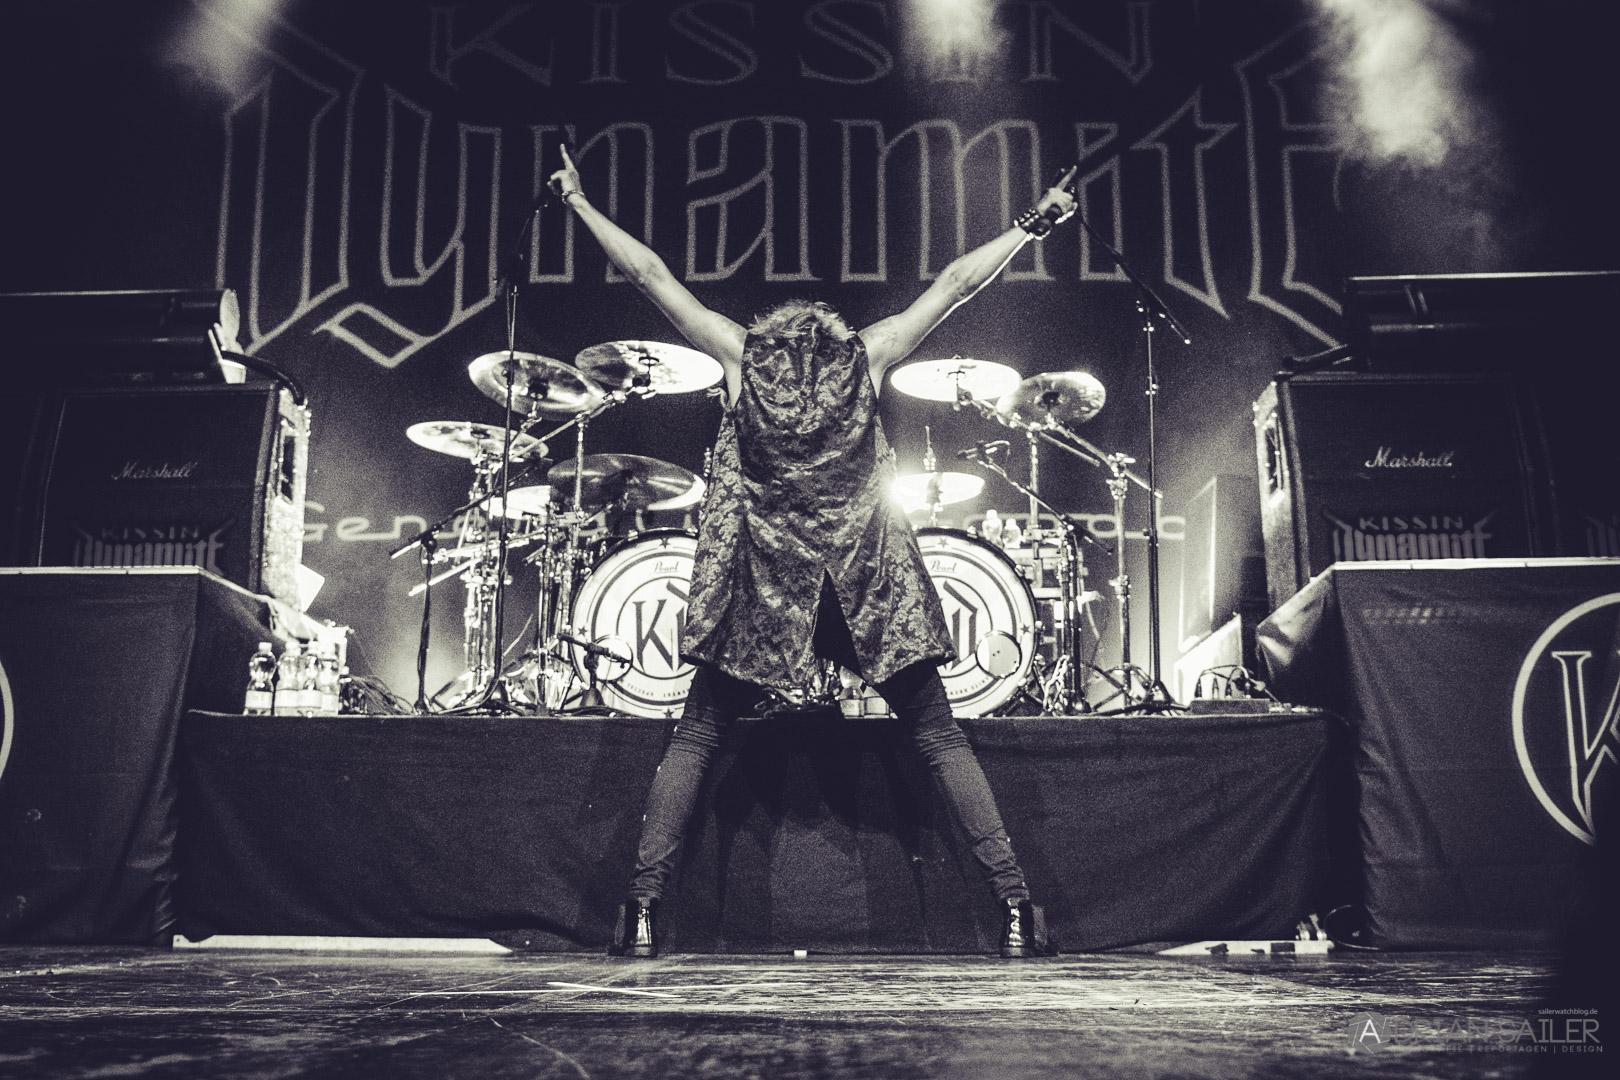 kissin-dynamite-z7-oktober16-adriansailer-37